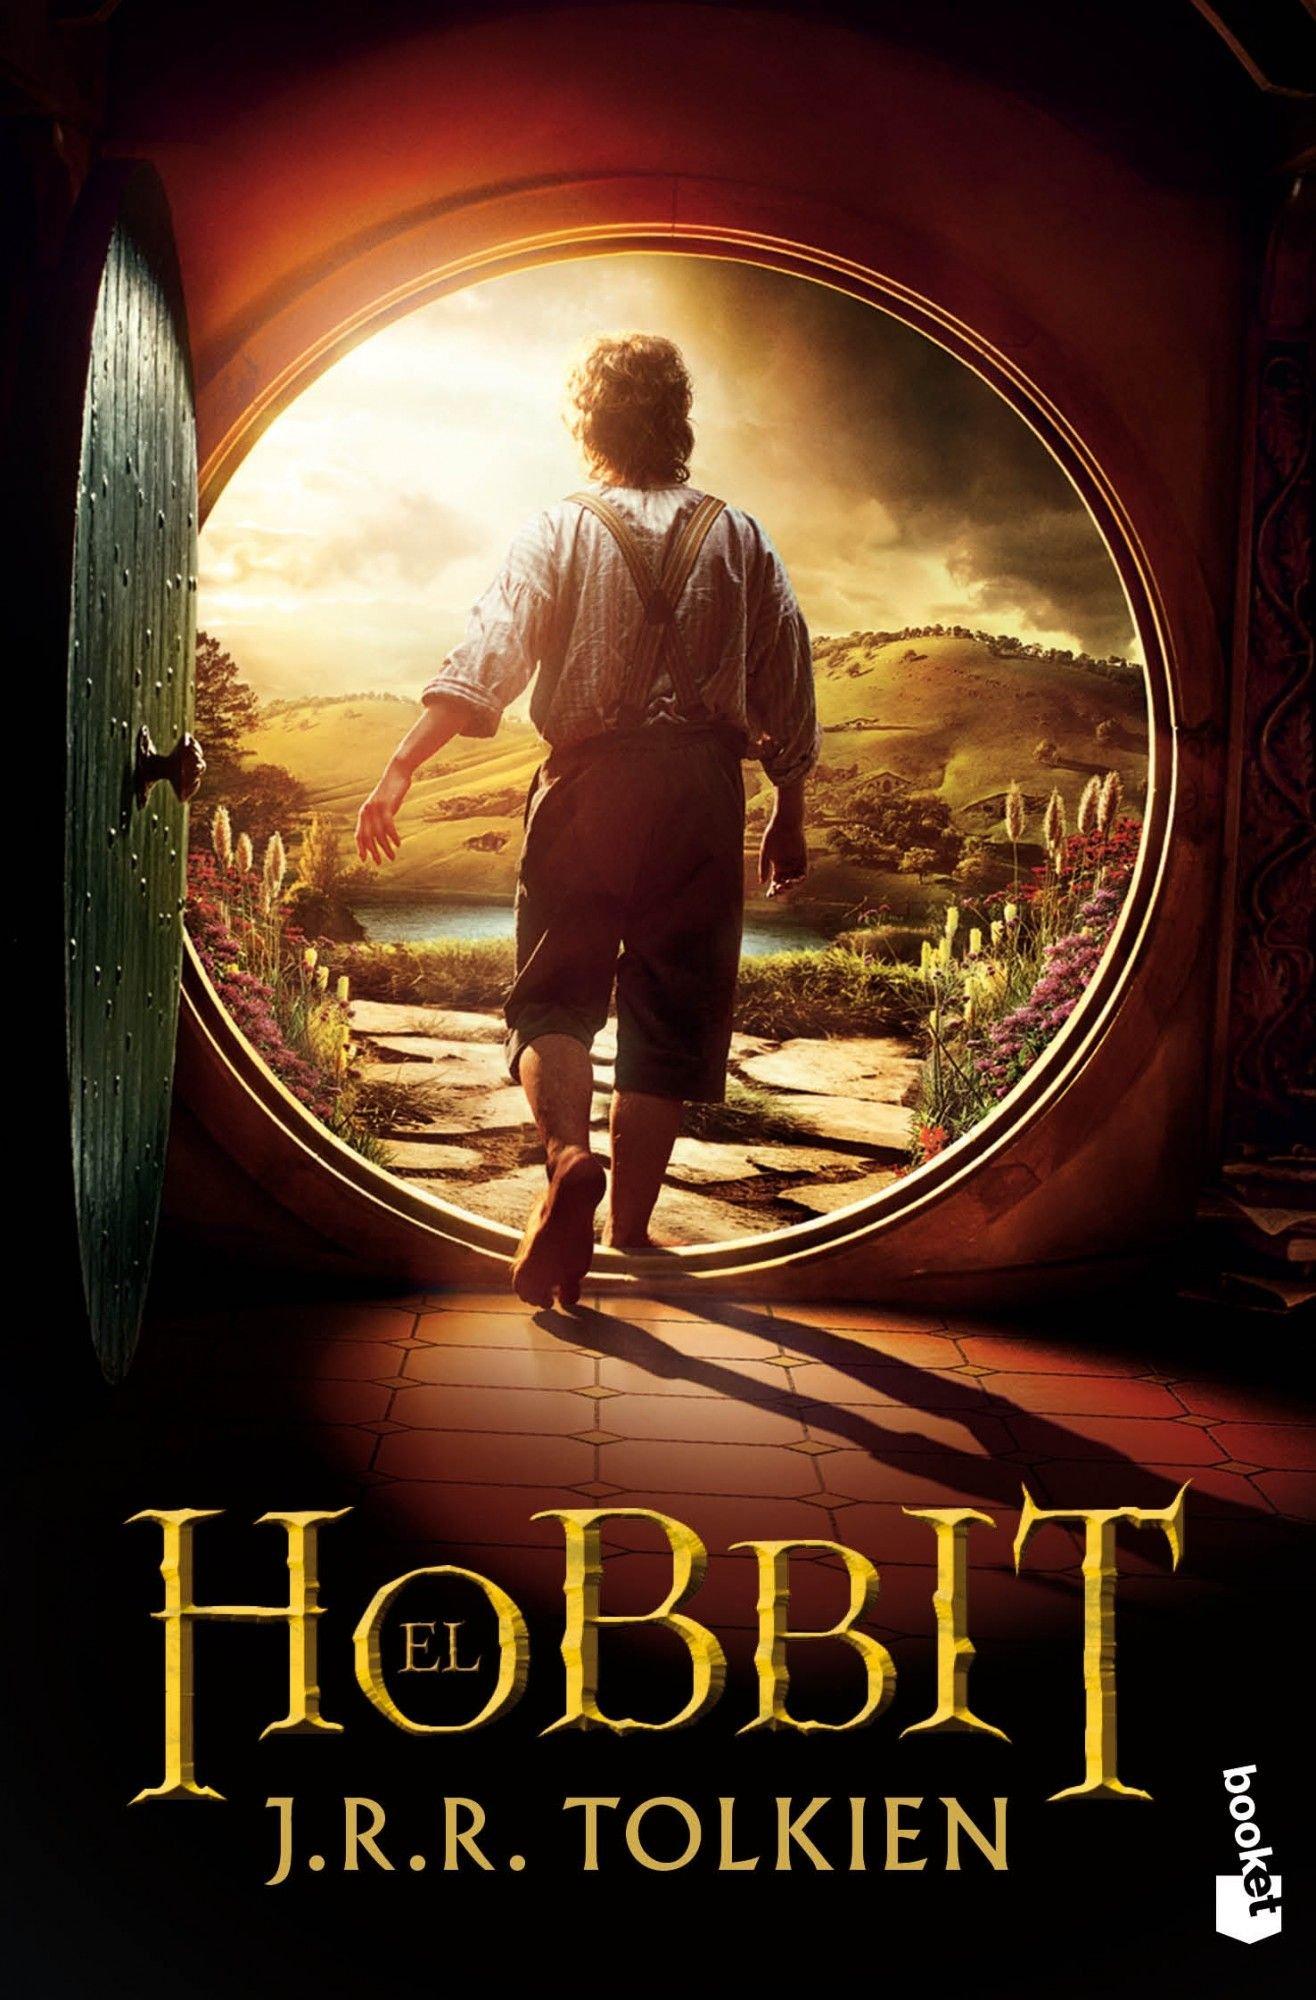 Portada libro - El hobbit